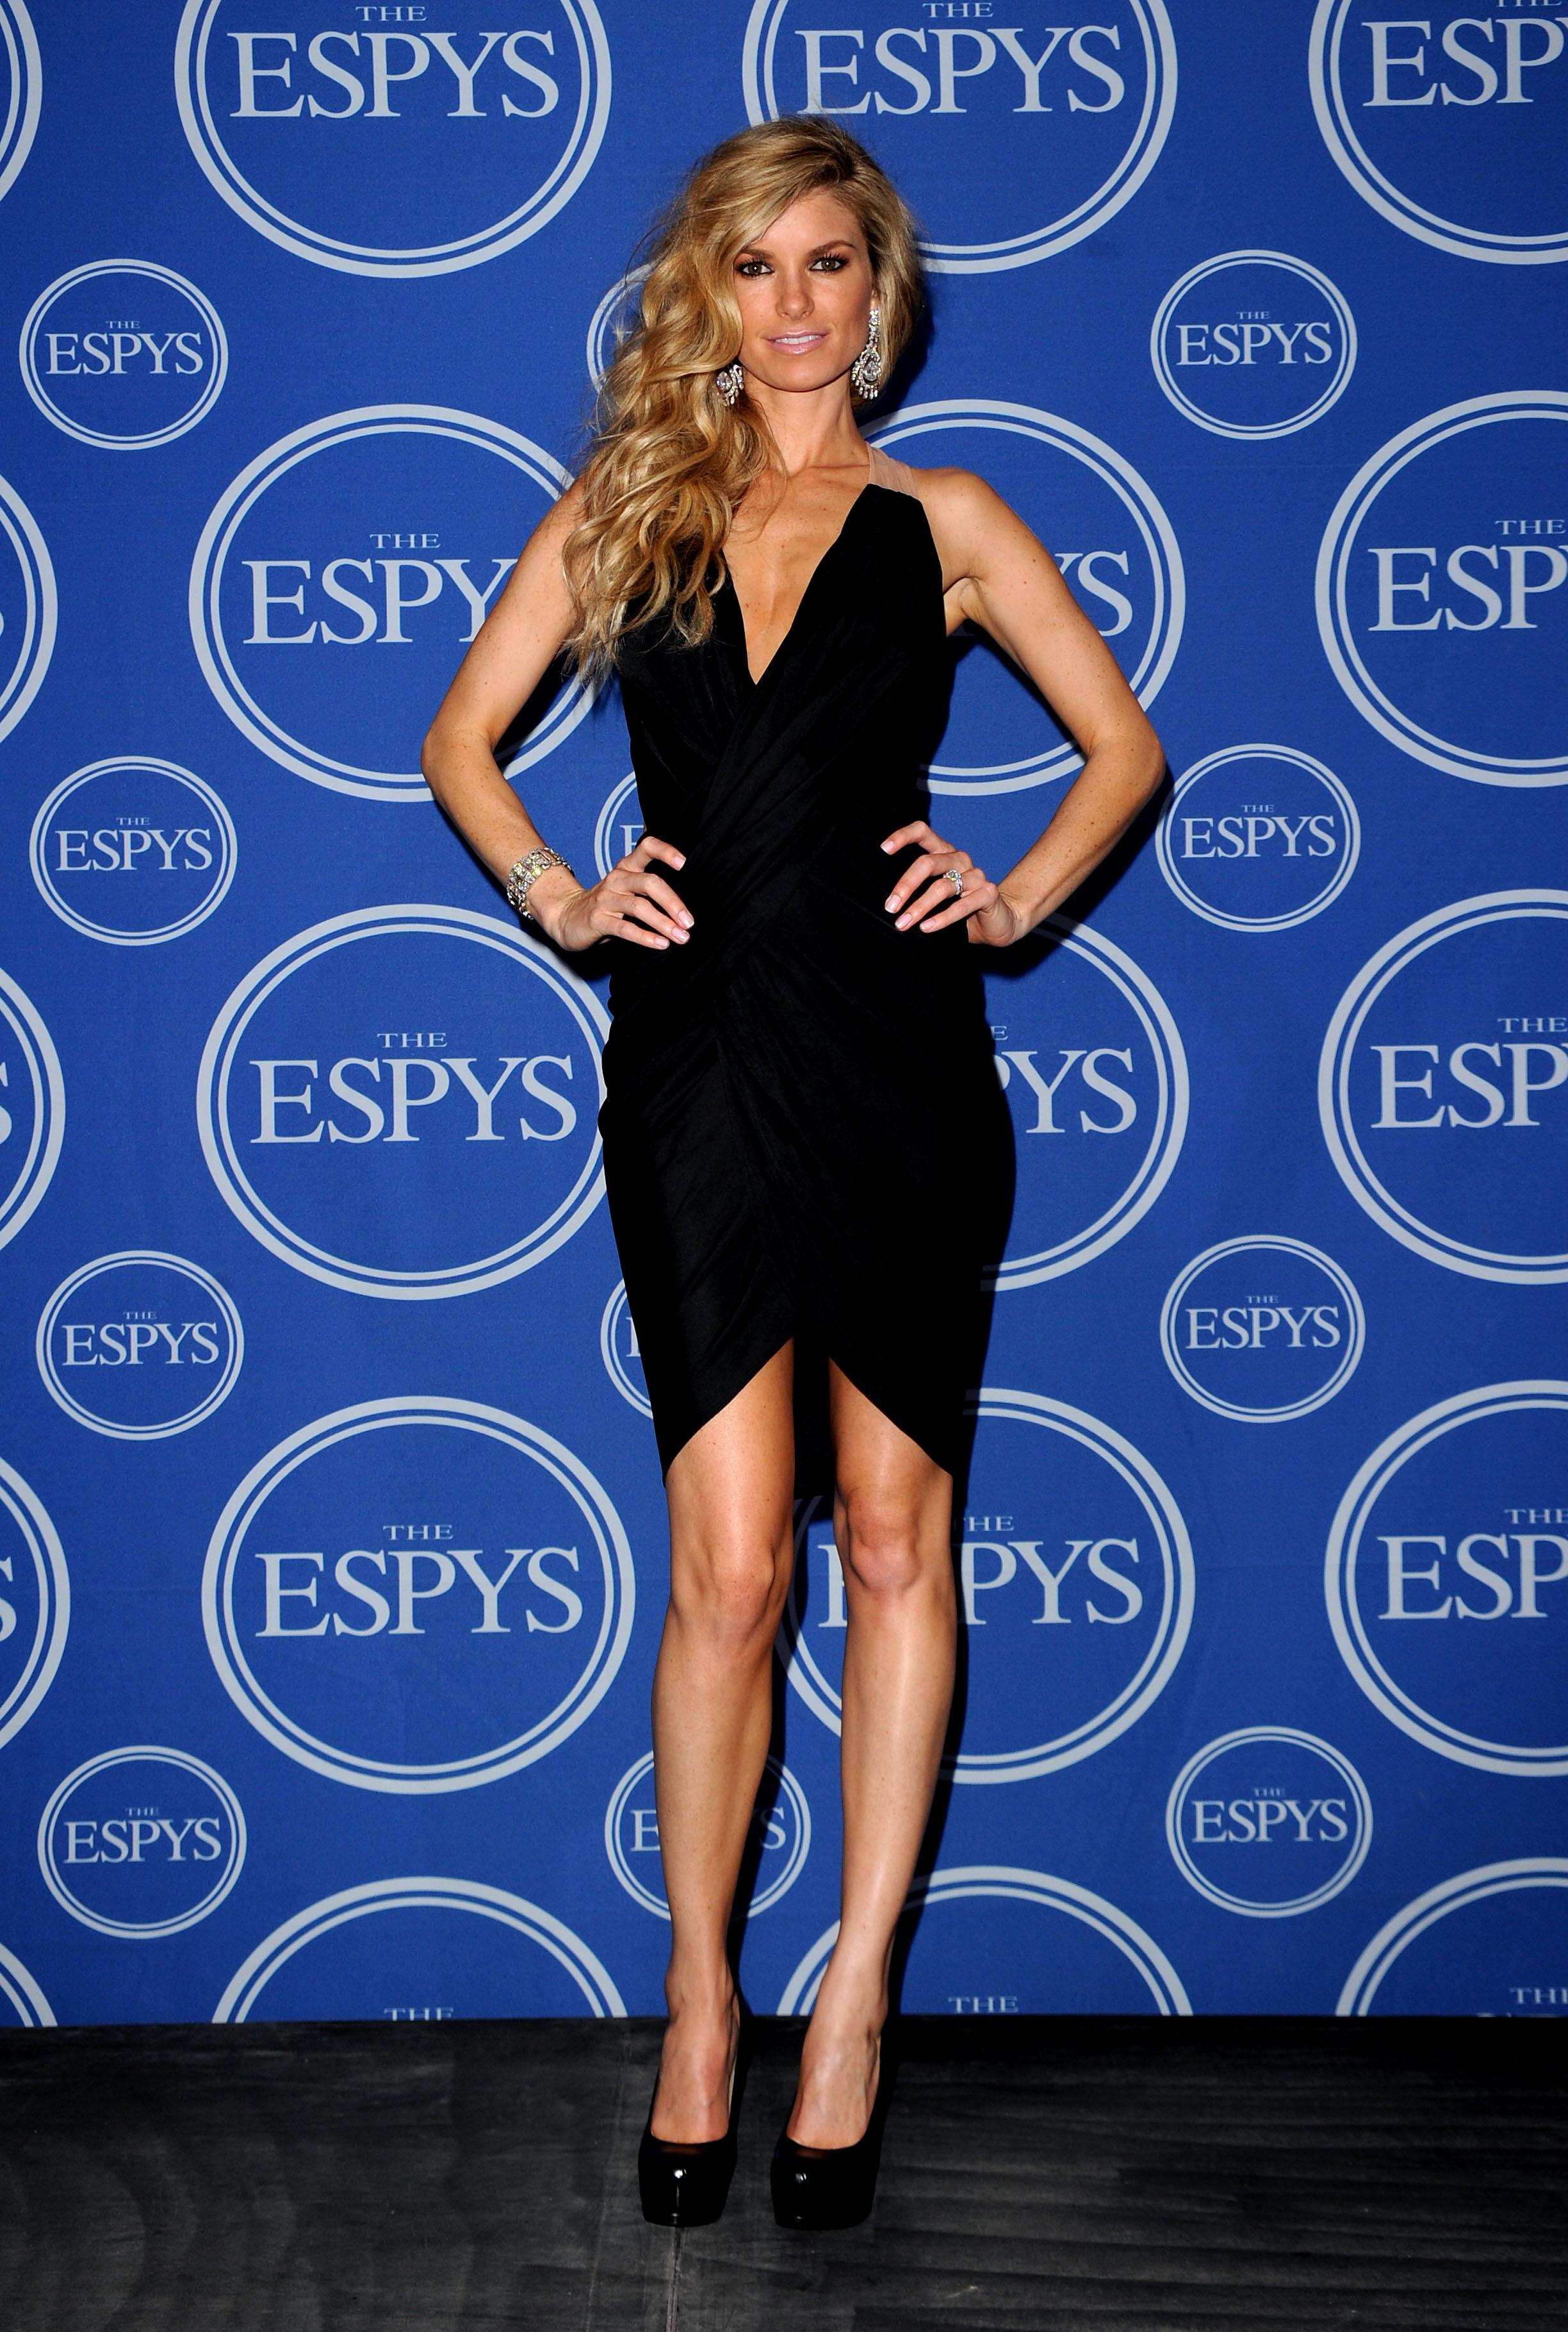 00708_Marisa_Miller_ESPY_Awards_13_122_564lo.jpg